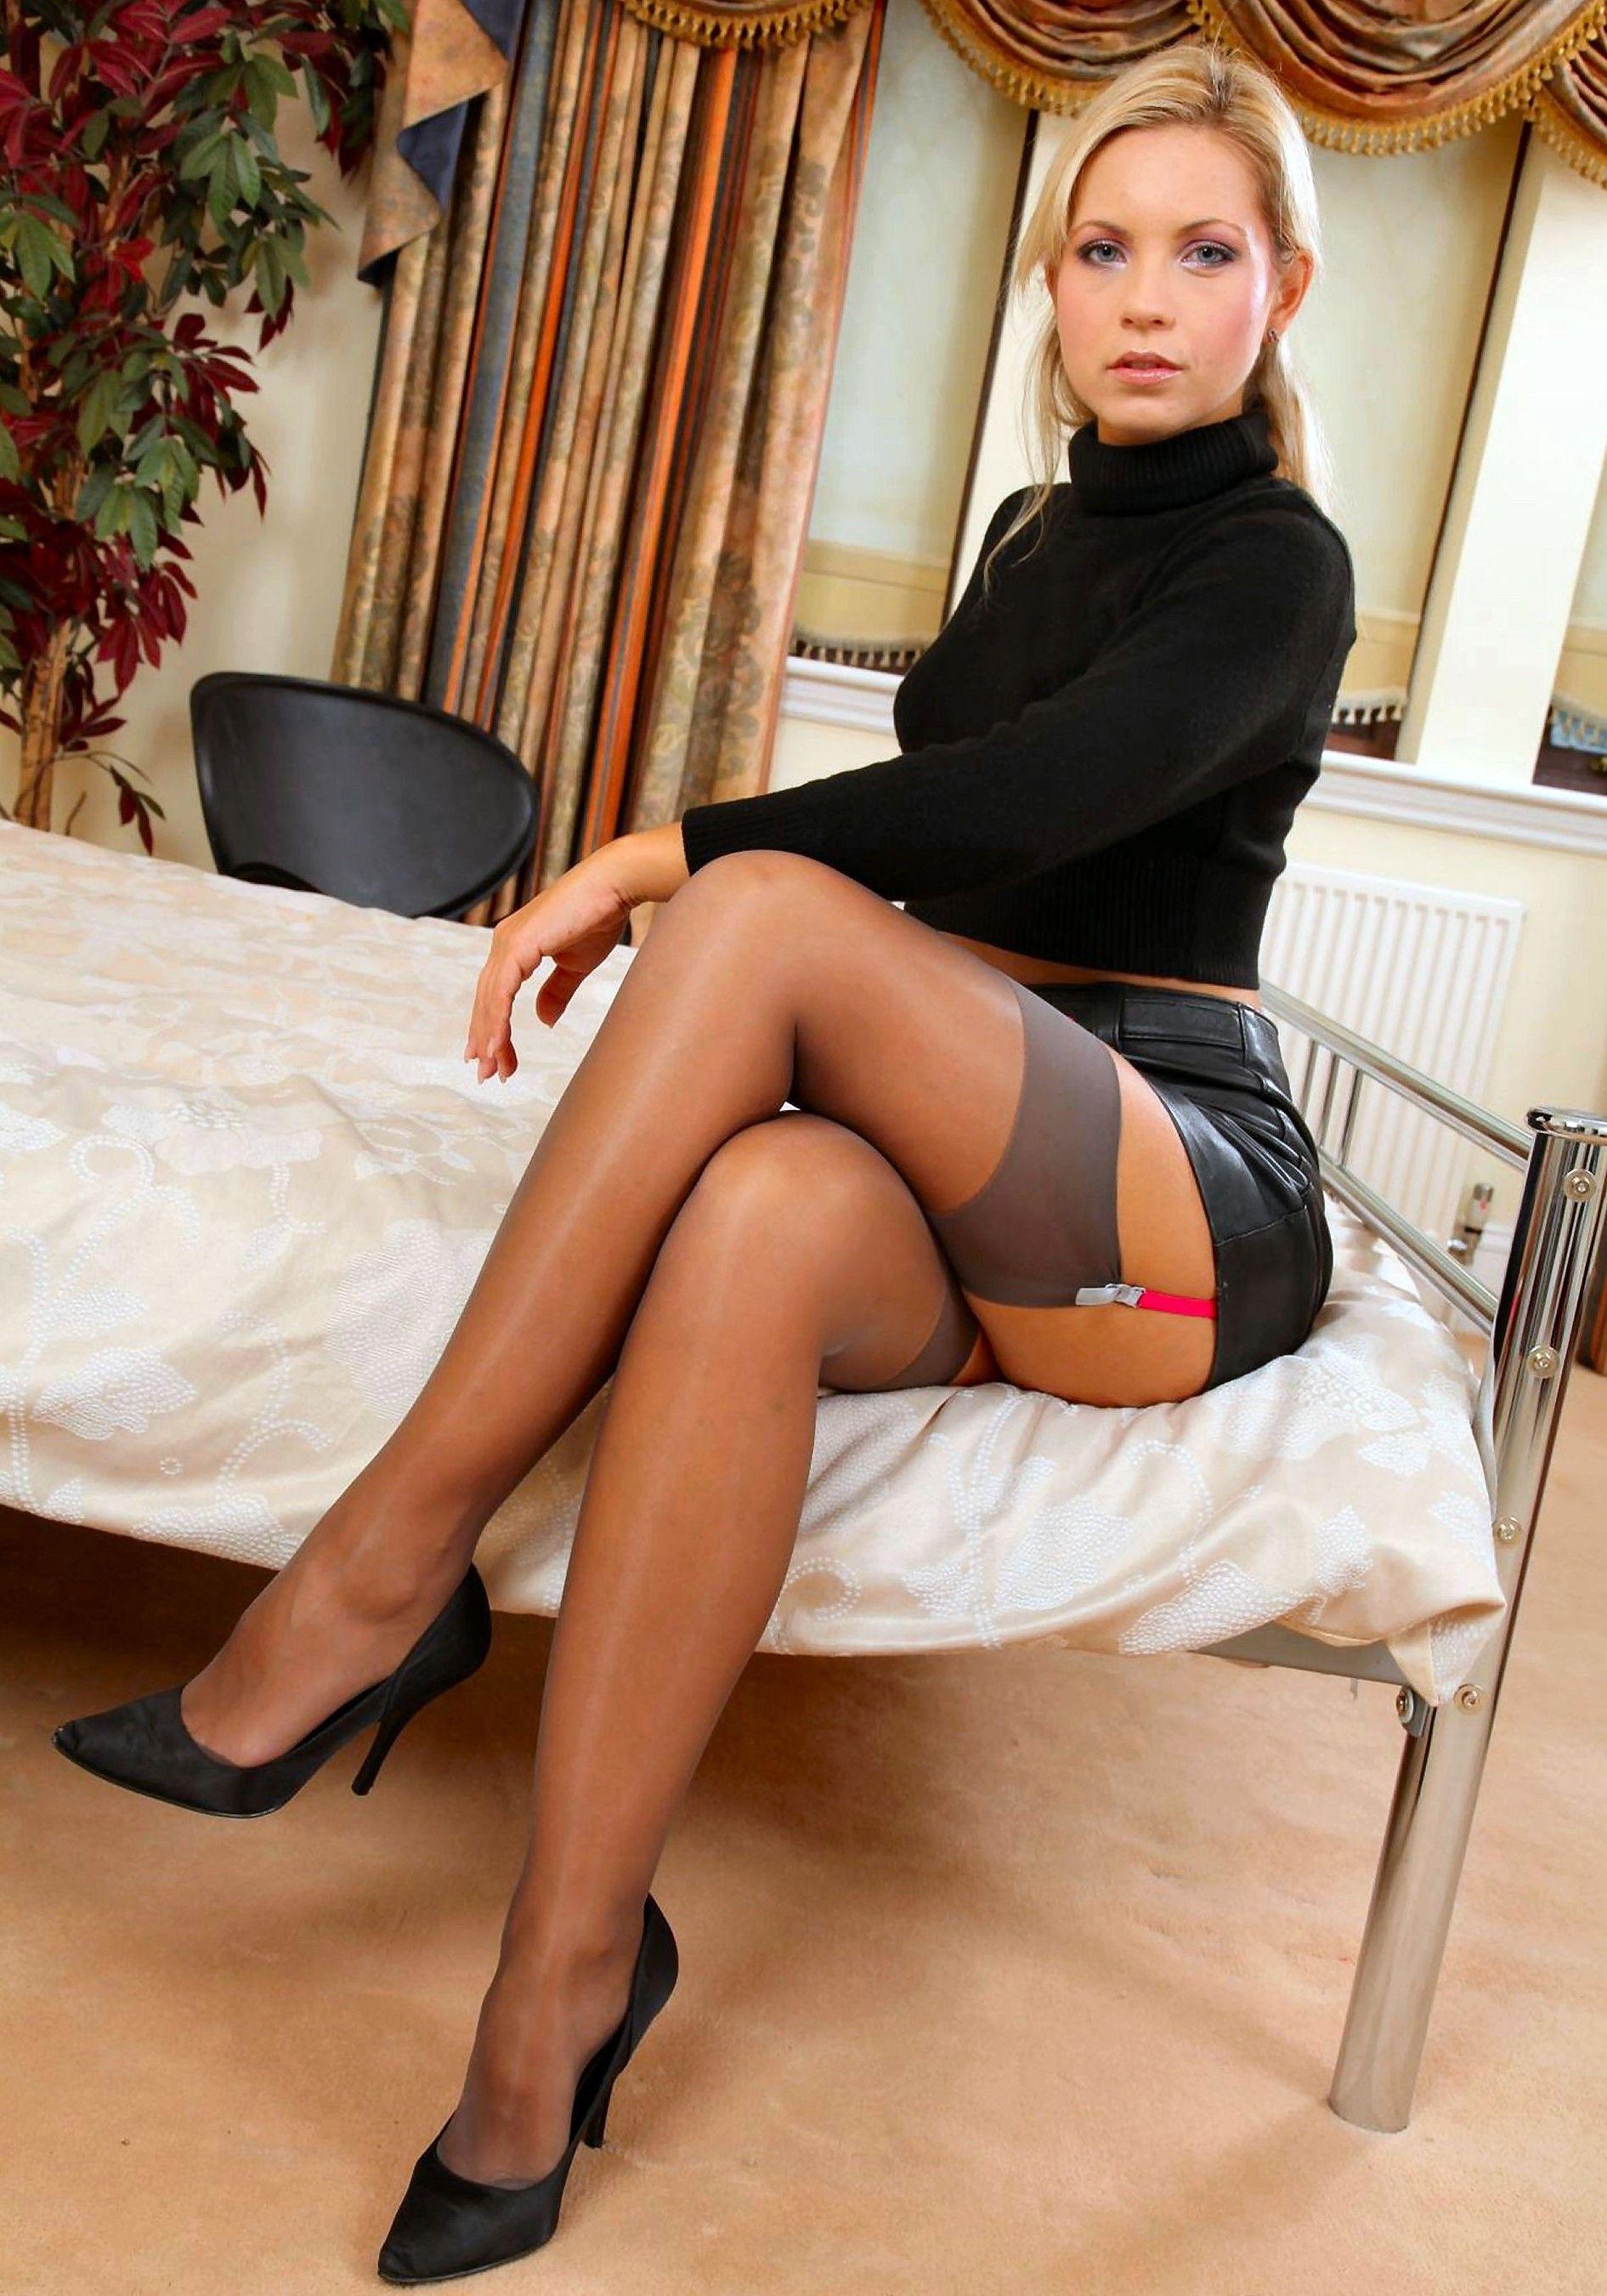 Teen Milf Mature Sexy Dressed Like Slut Pantyhose Stockings Skirt Dress Teasing With Her Legs Heels